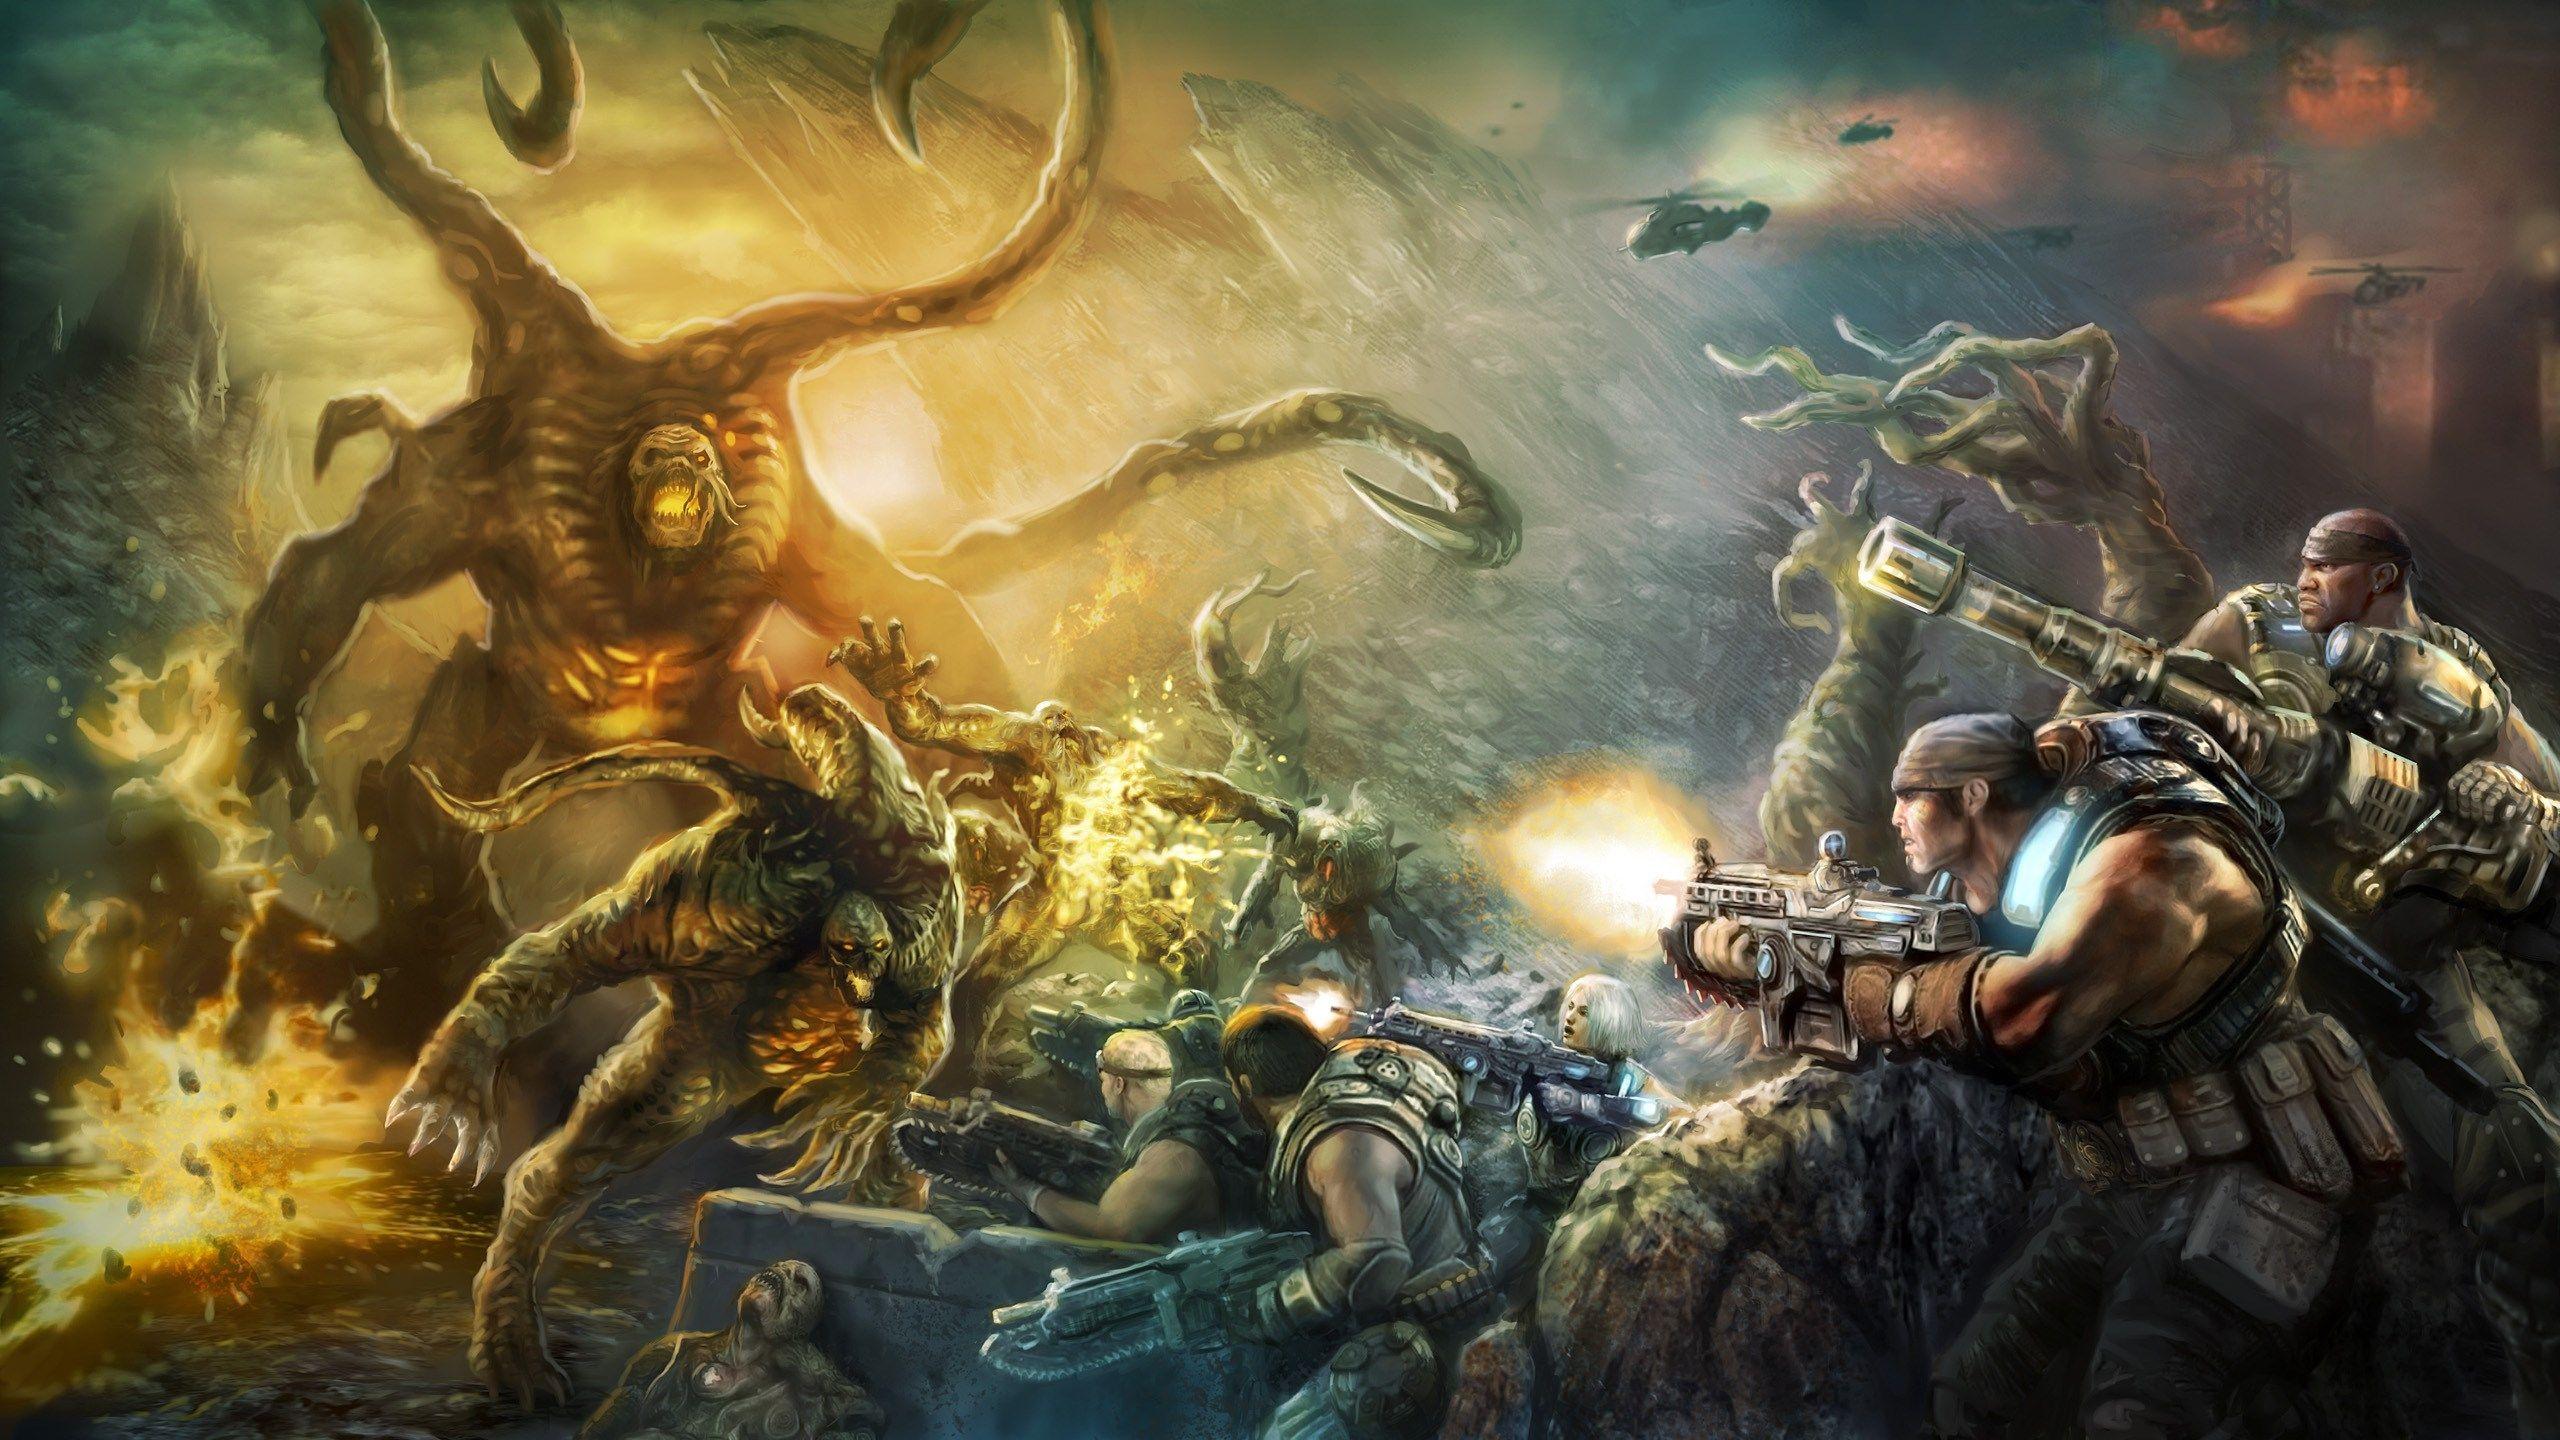 Gears Of War Full Hd Pictures 2560x1440 Gears Of War Gears Of War 3 War Artwork